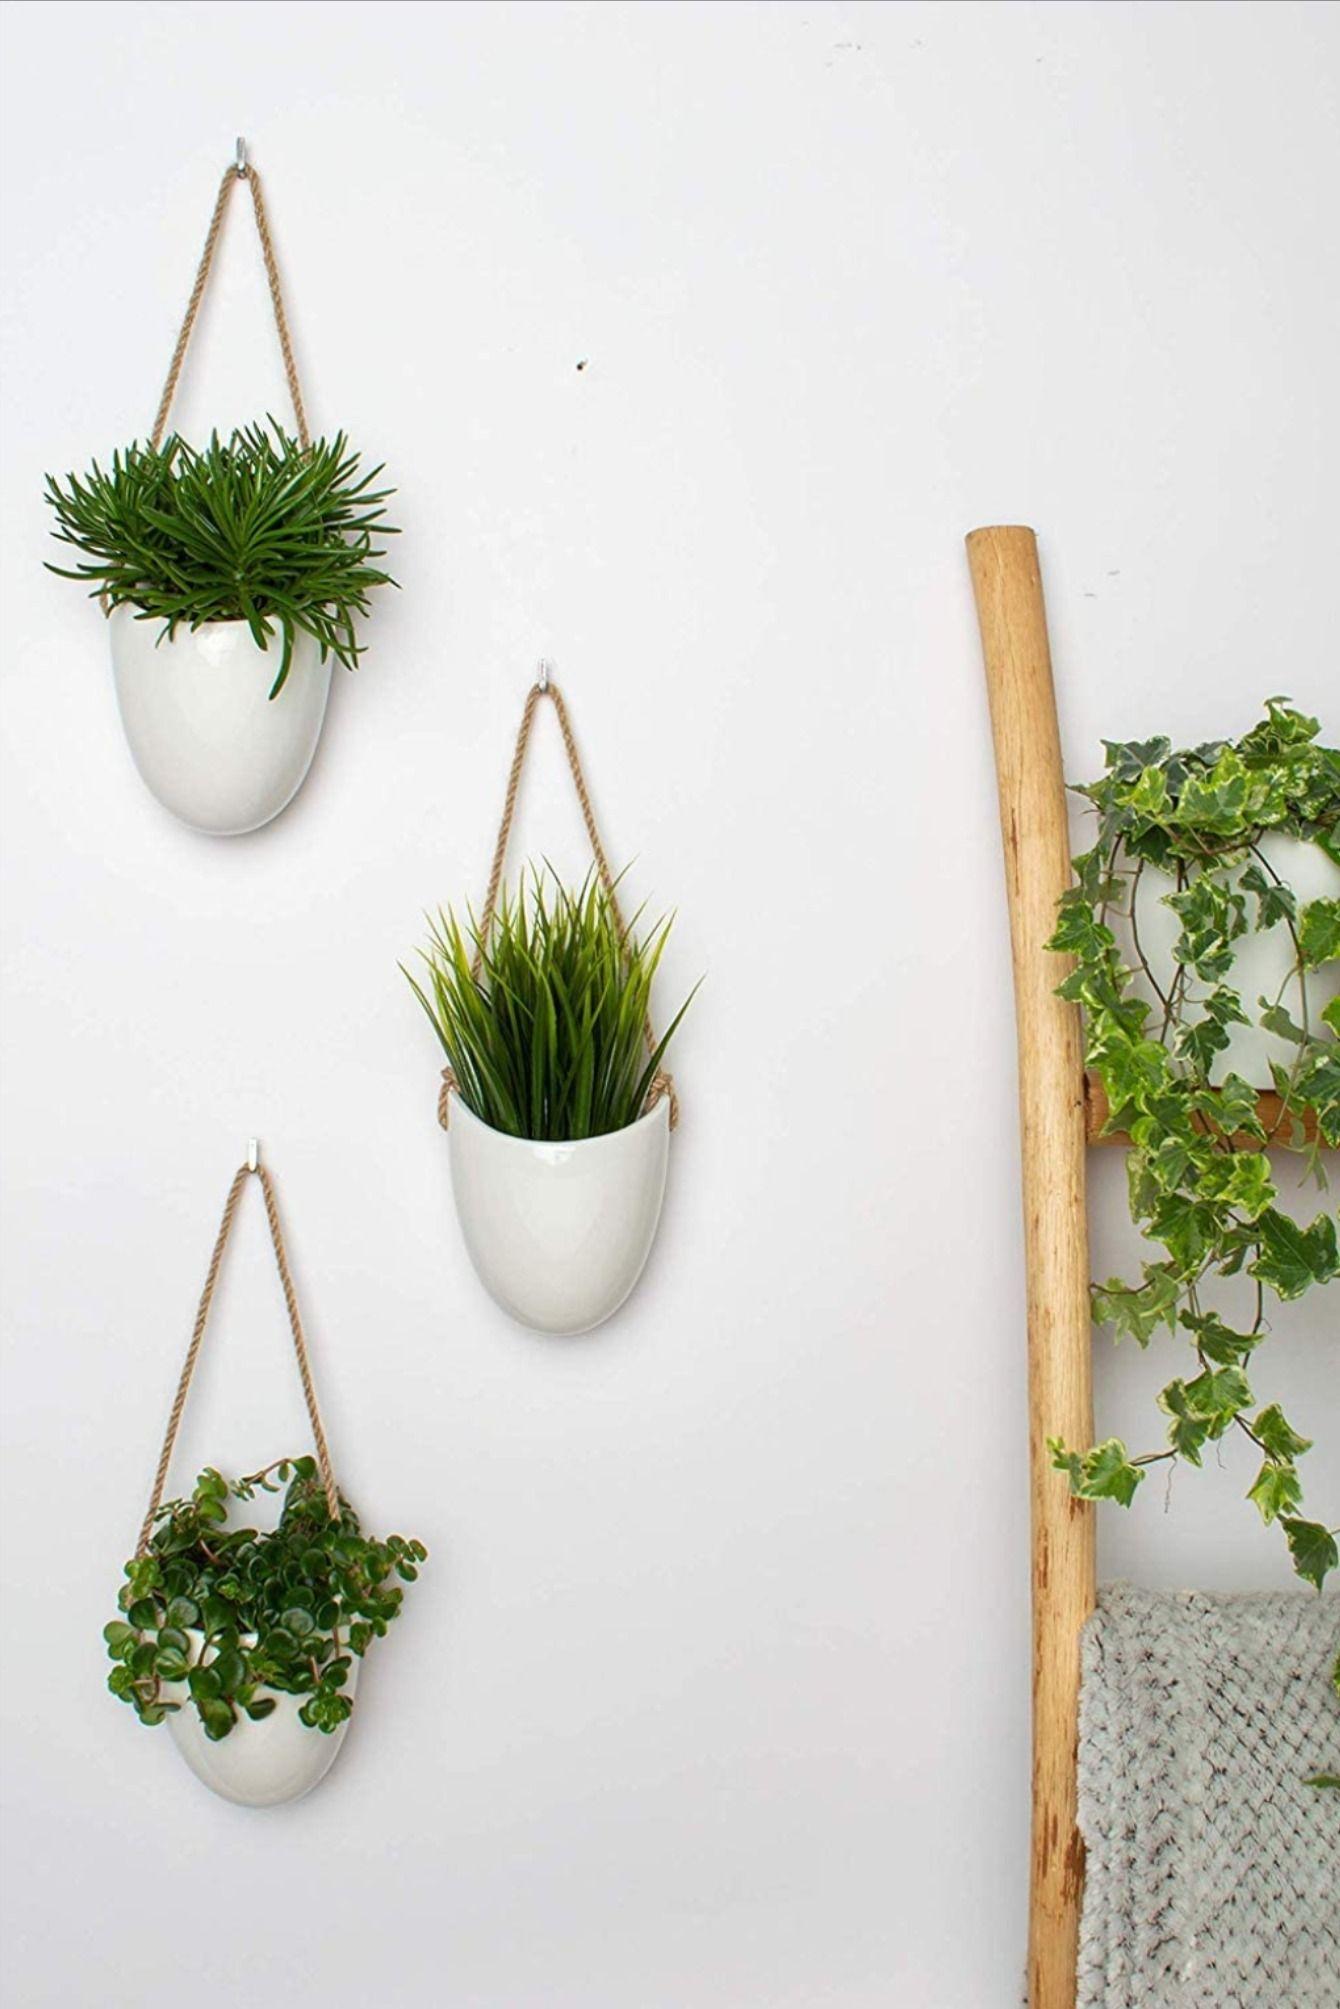 Wandvasen 3 Teiliges Set Aus Weisser Keramik Wanddeko Vase Planzen Wand Schmucken In 2020 Wandvase Weisse Keramik Wandschmuck